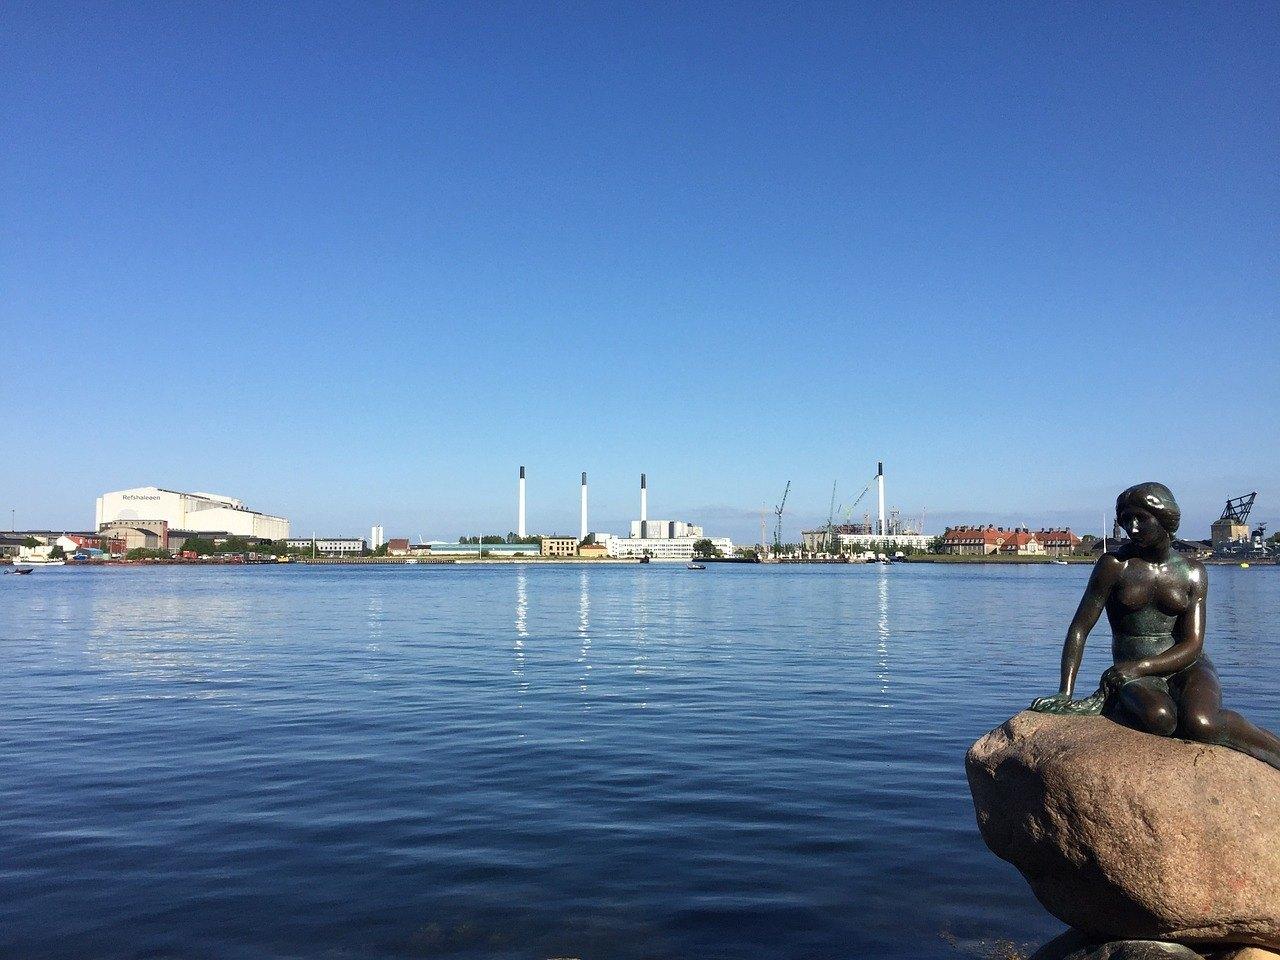 Osterbro, Copenhagen